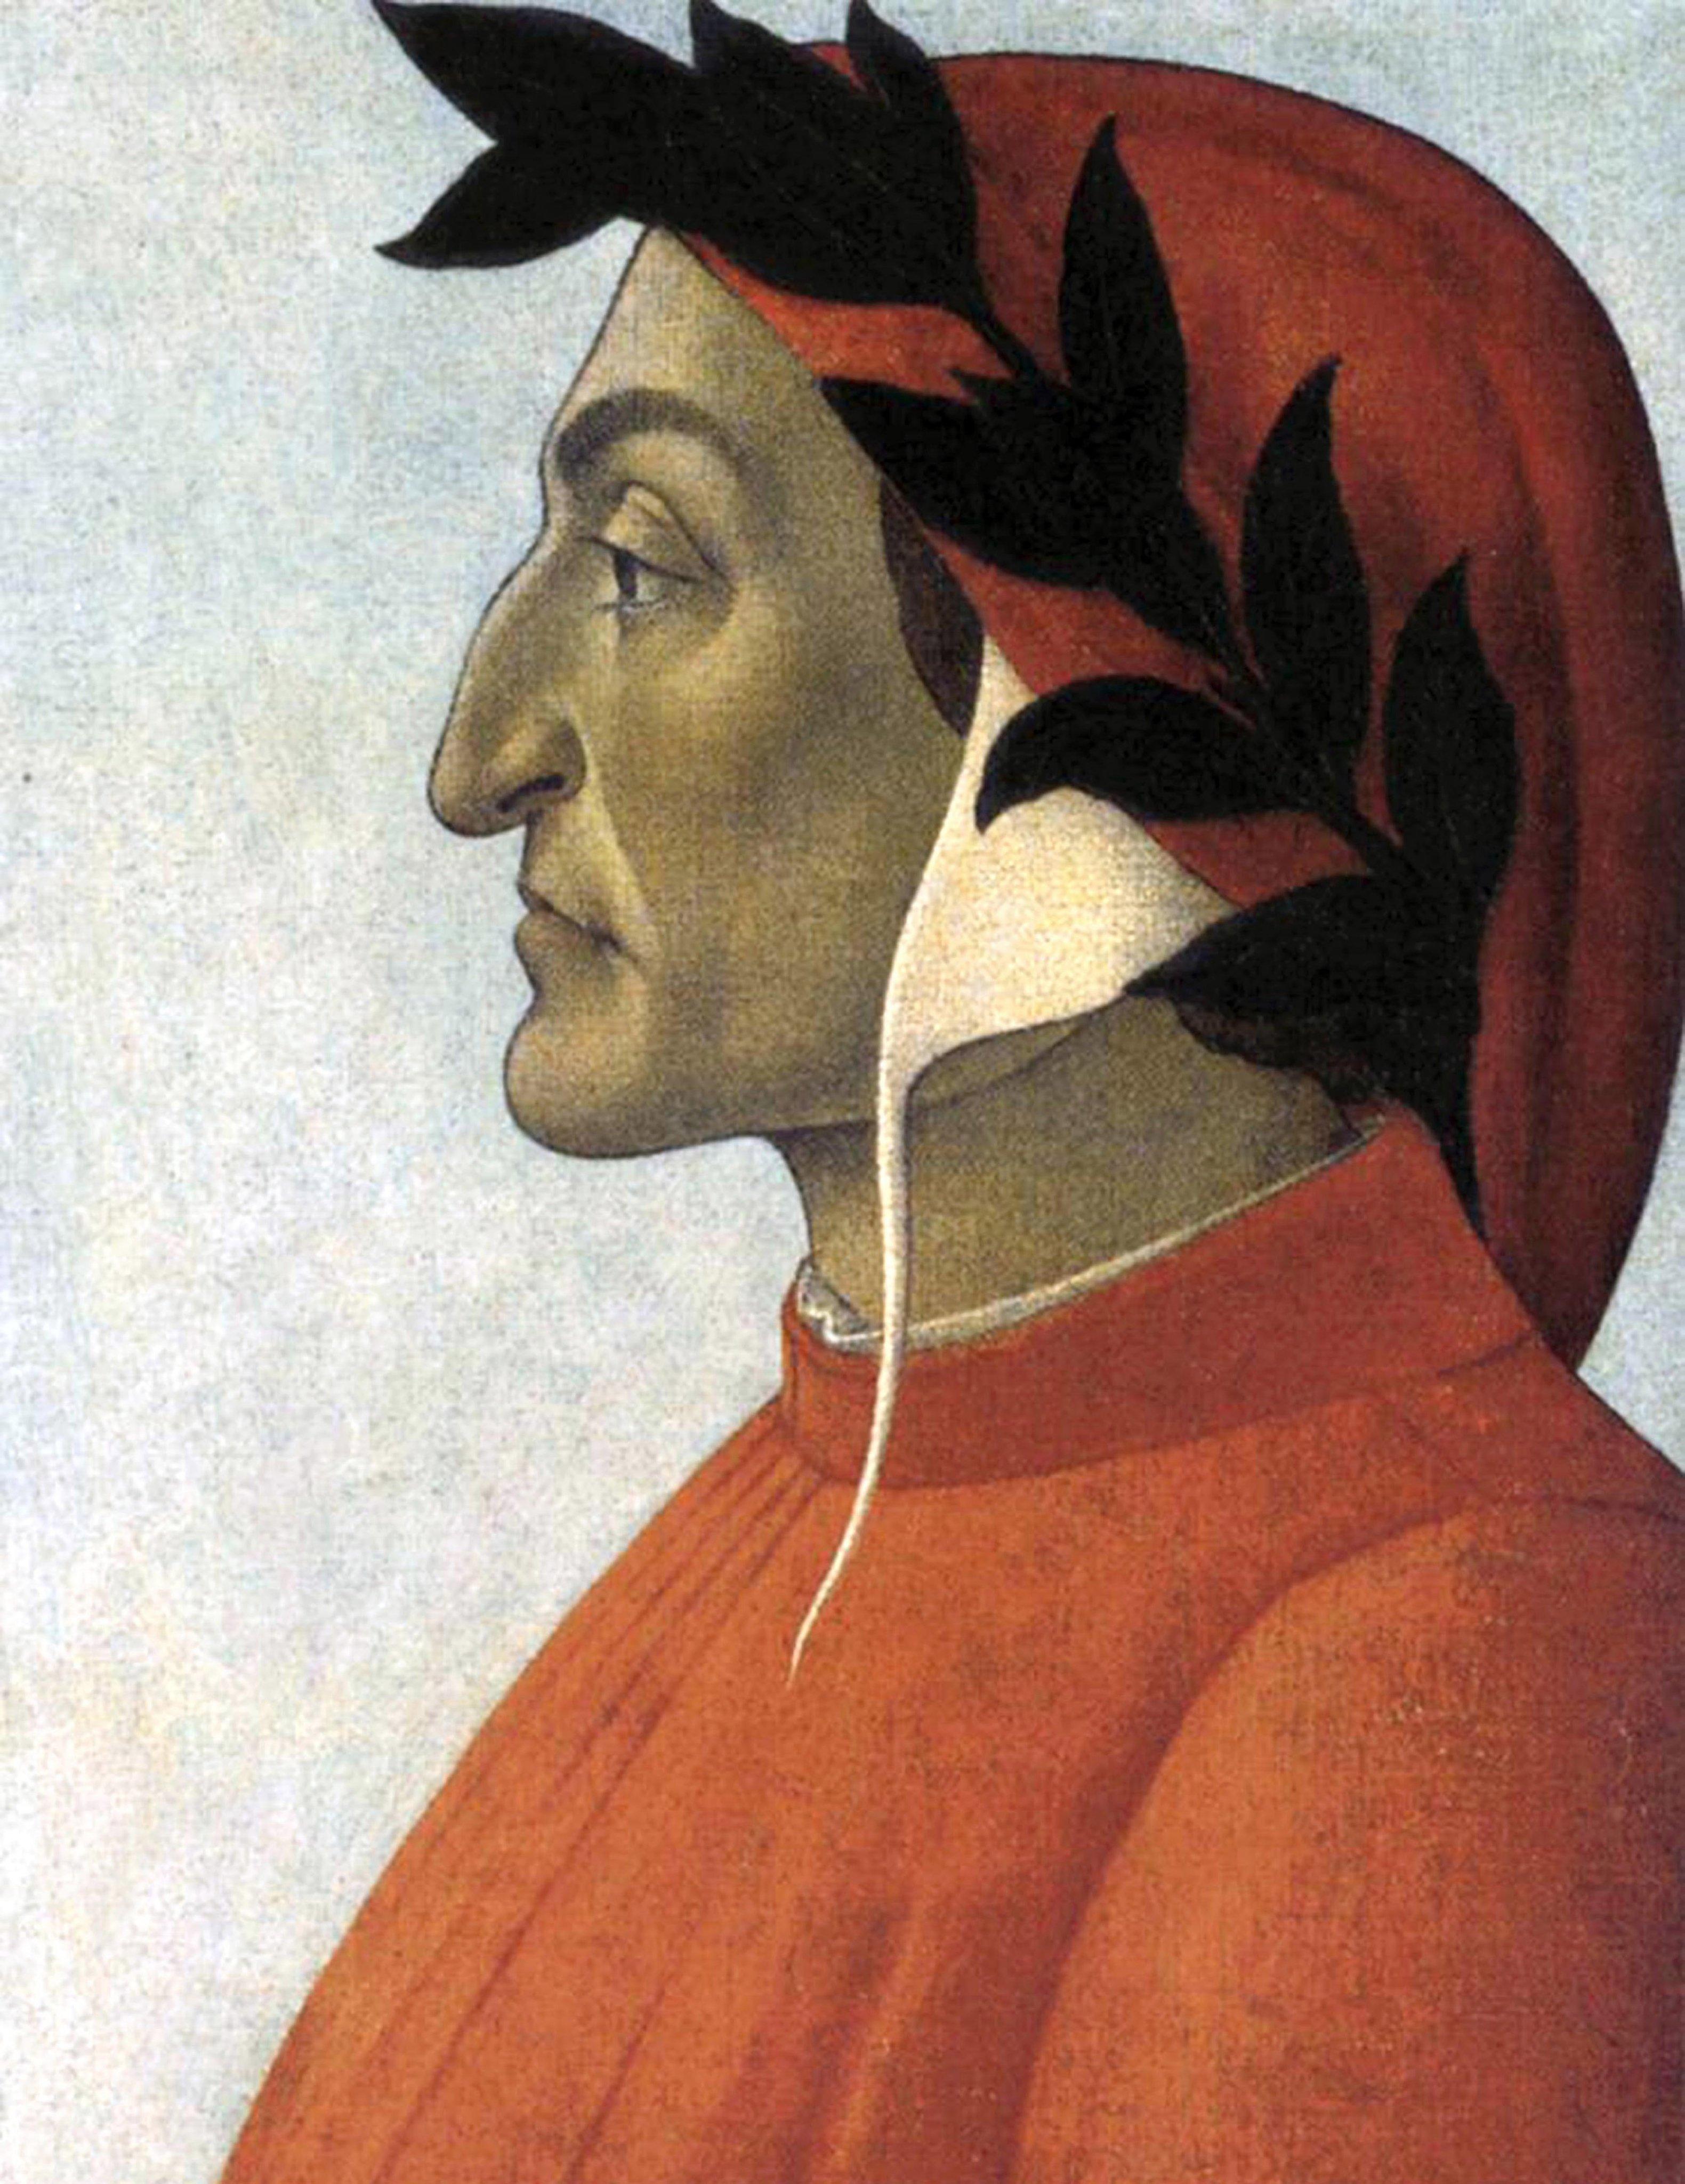 Dante Alighieri (c1265-1321) known as Dante, Italian poet. Portrait c1495 by Sandro Botticelli (c1445-1510) Italian Early Renaissance painter.